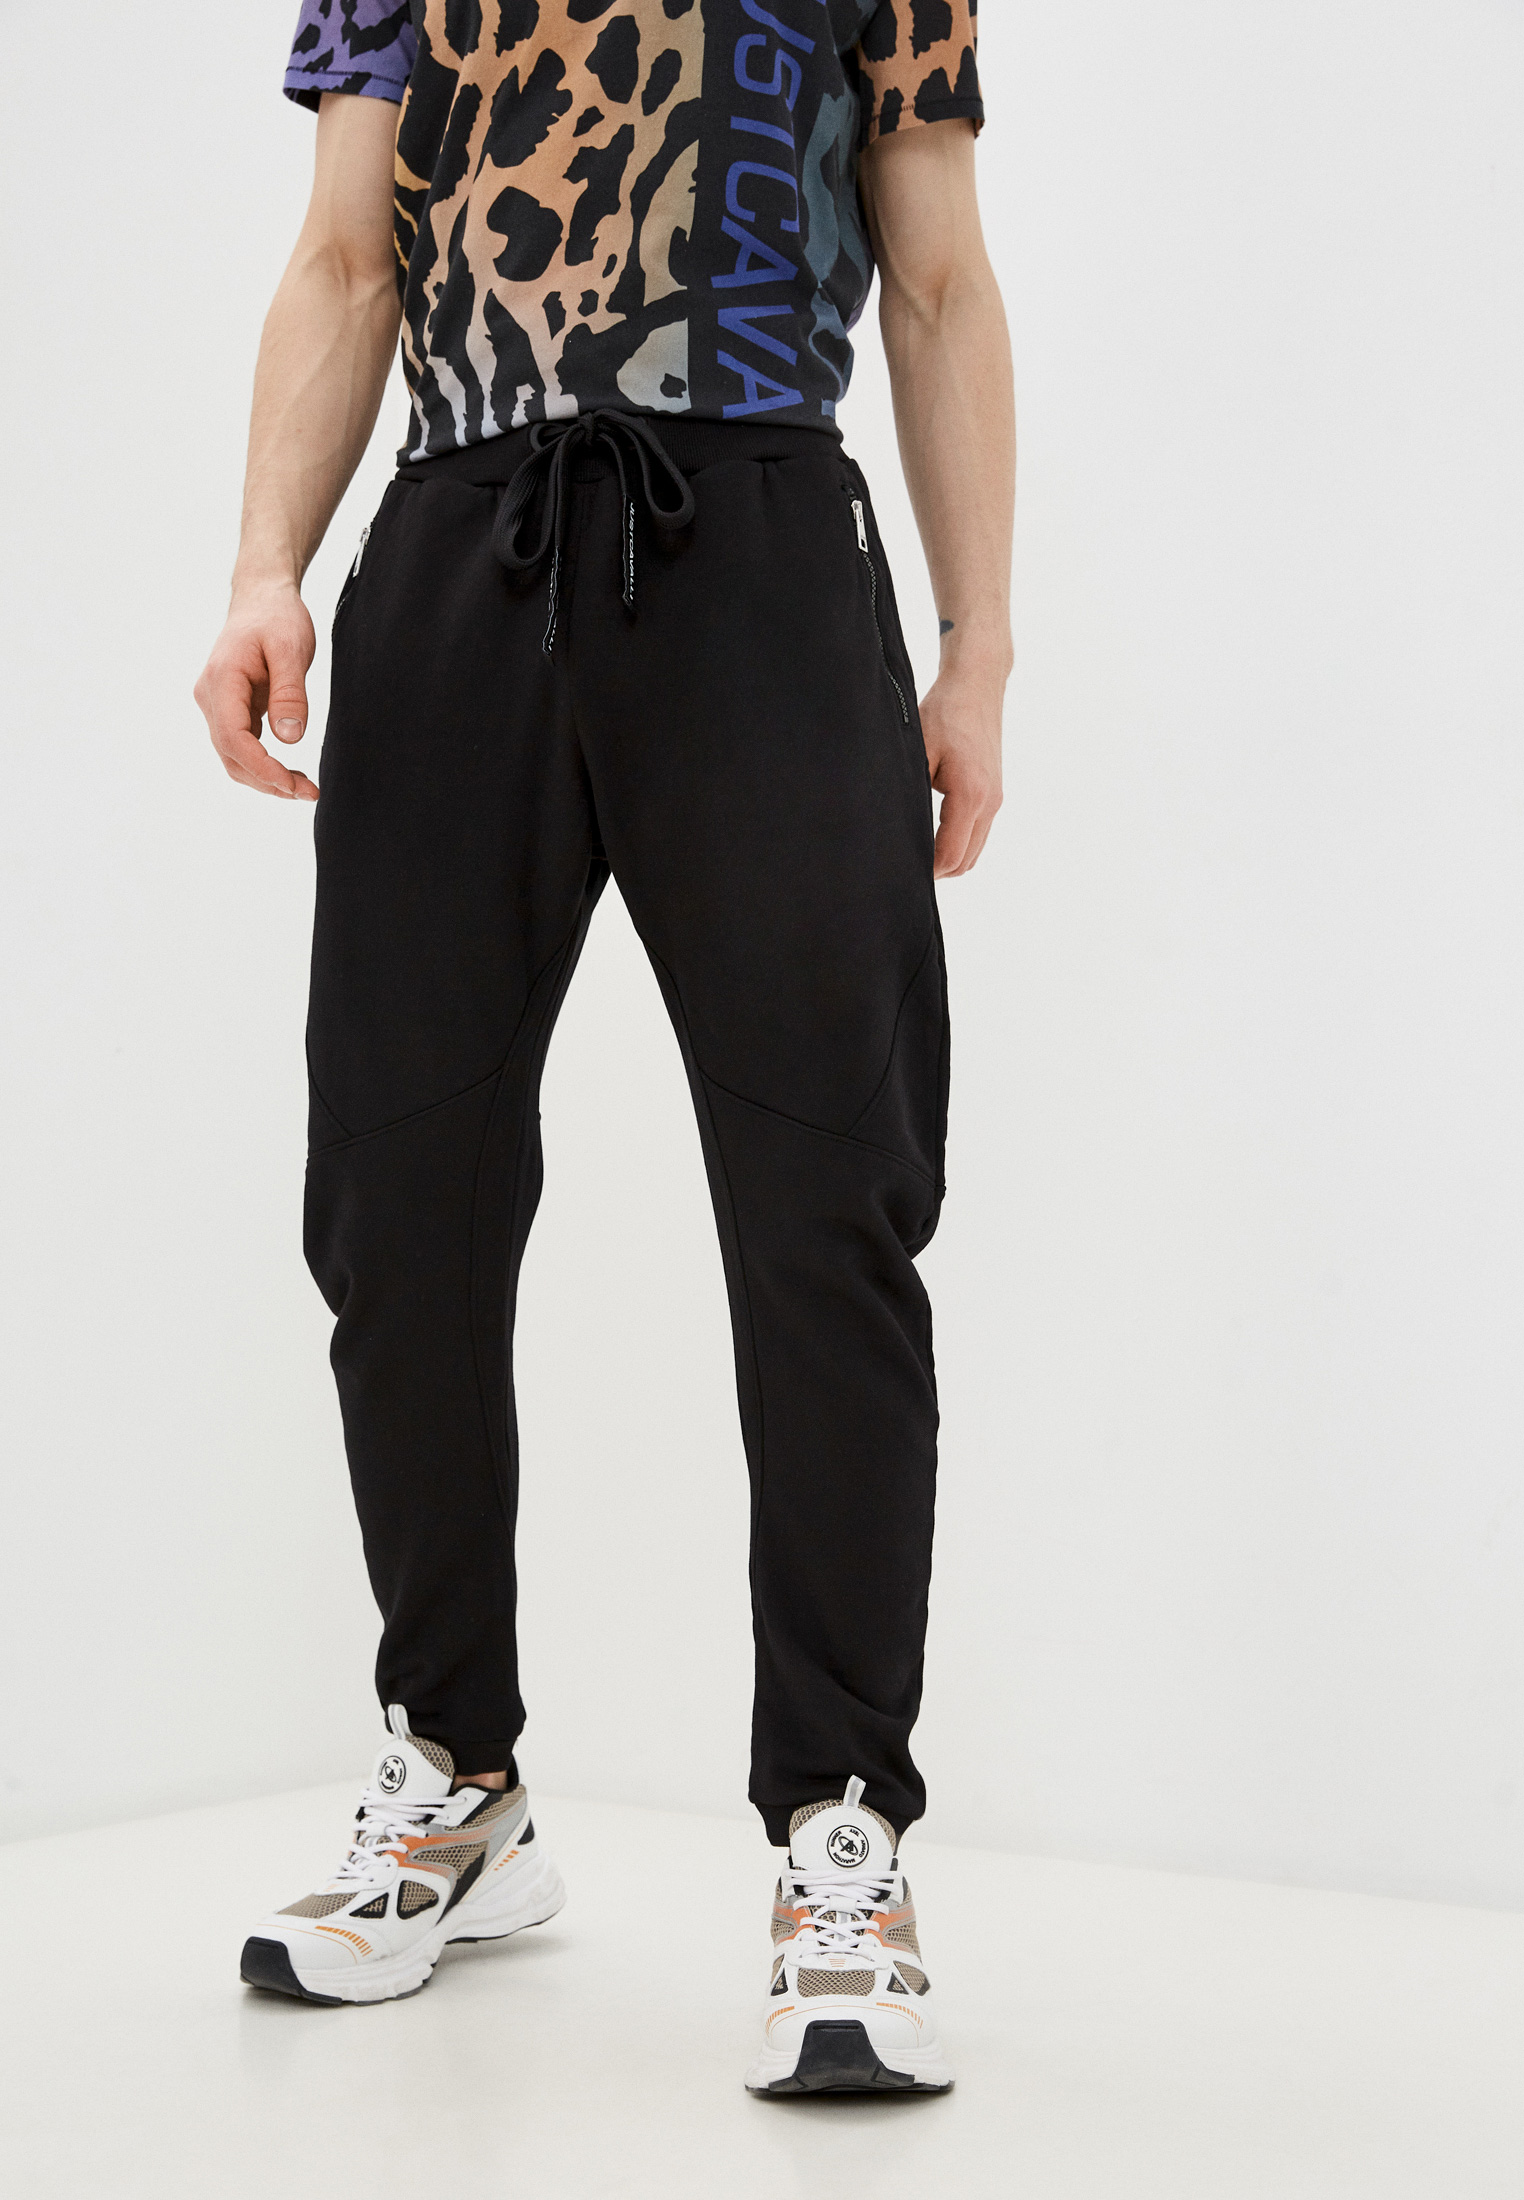 Мужские спортивные брюки Just Cavalli (Джаст Кавалли) S01KA0286N25189